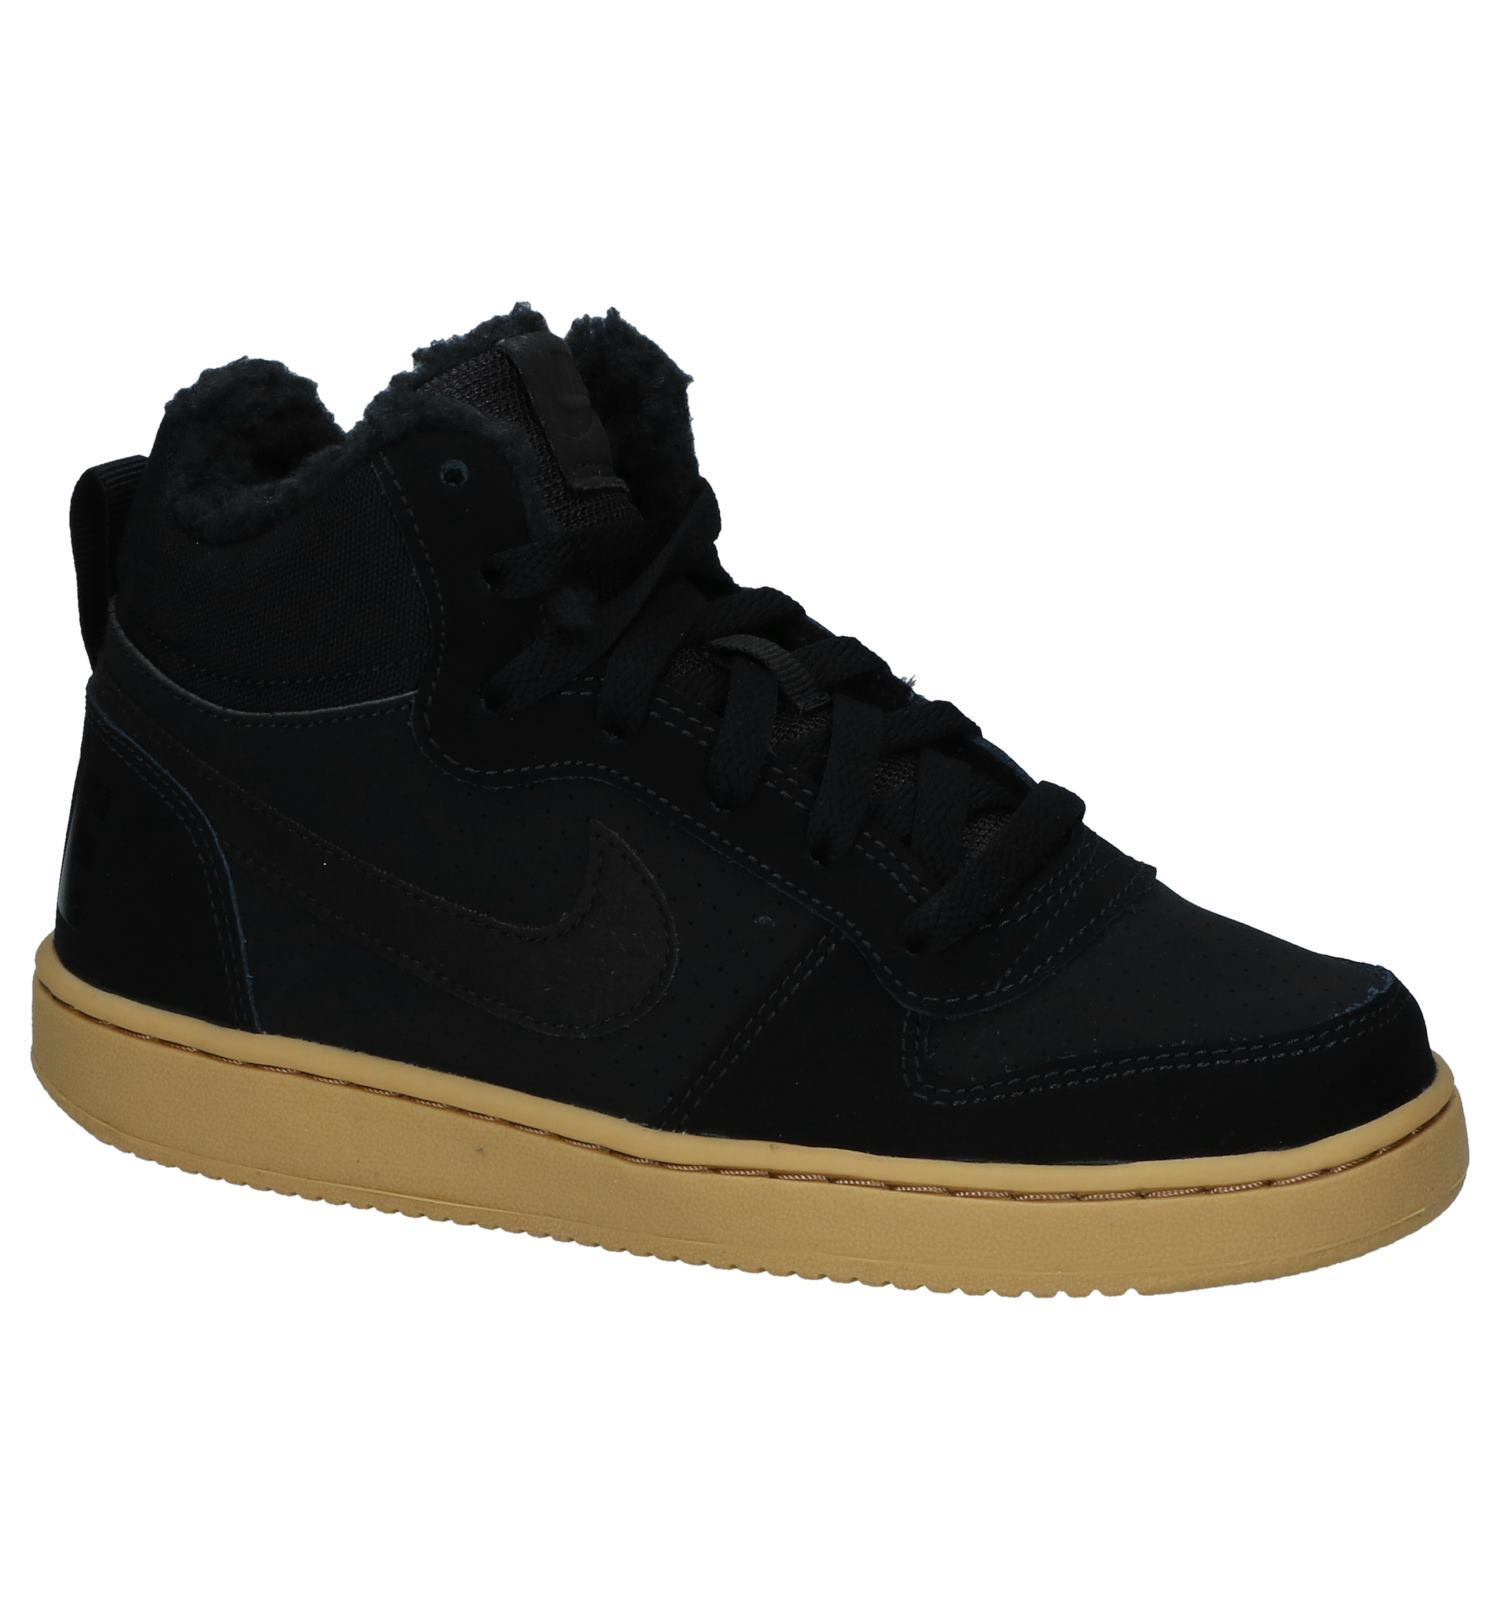 2194441535c Zwarte Hoge Sneakers Nike Court Borough Mid Winter | TORFS.BE | Gratis  verzend en retour